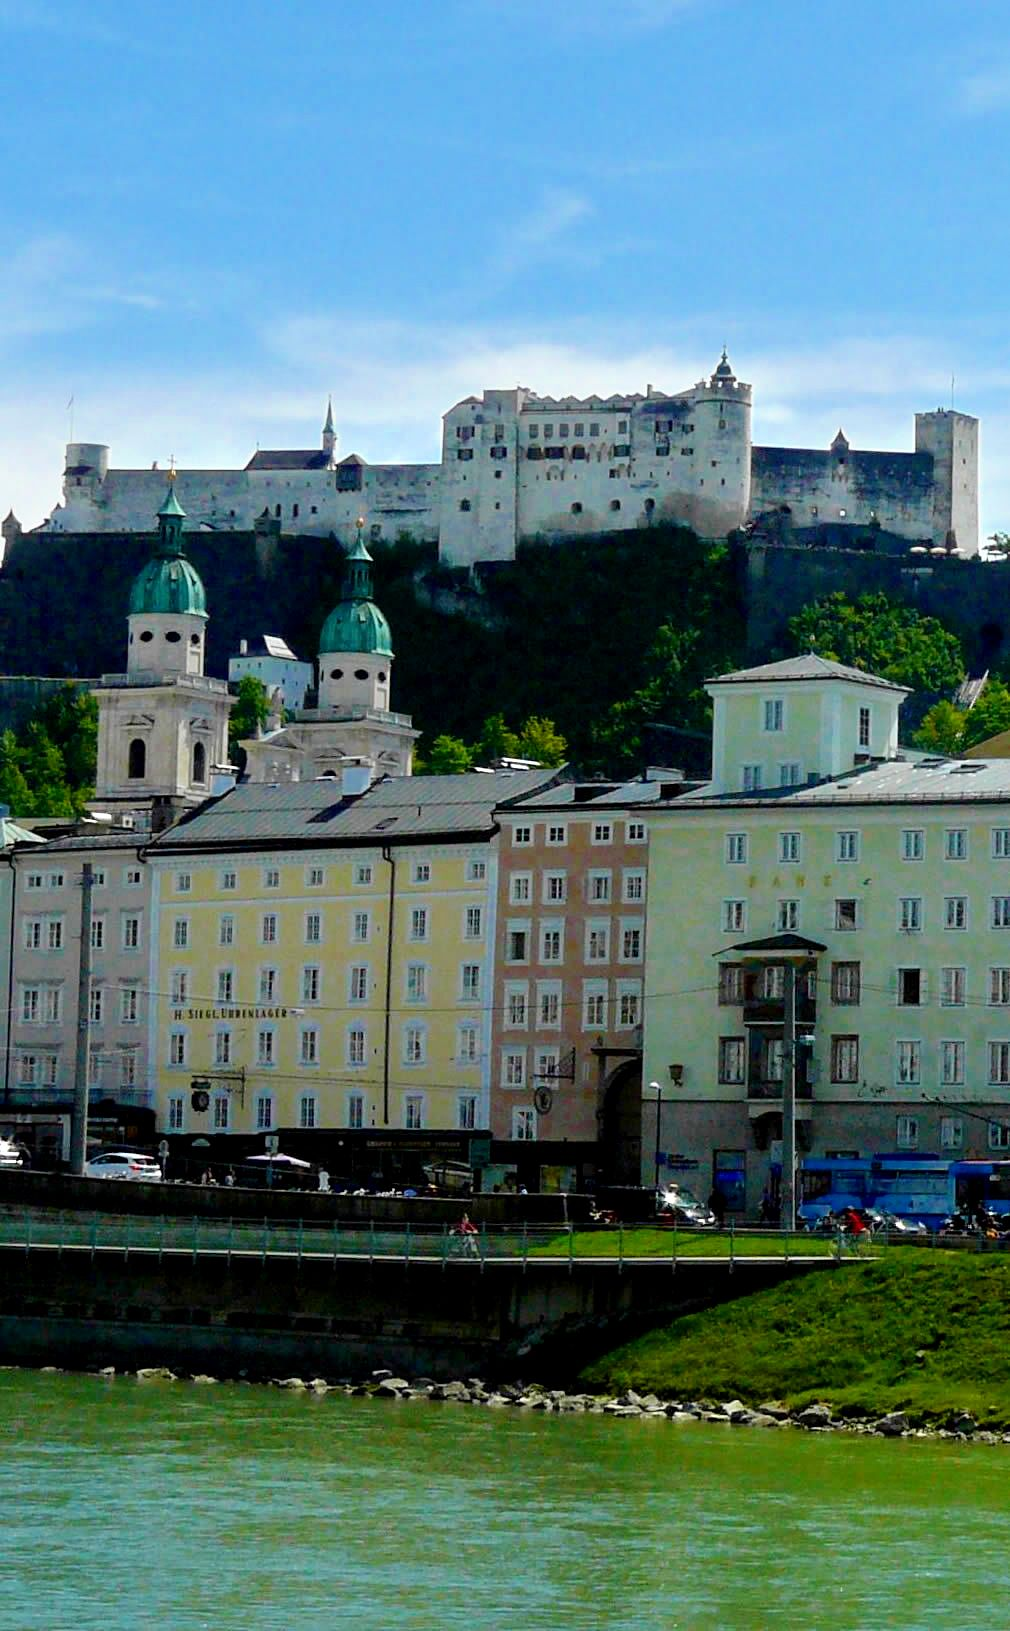 Festung Hohensalzburg, Fortaleza Hohensalzburg, Fortress Hohensalzburg en Salzburgo, Austria